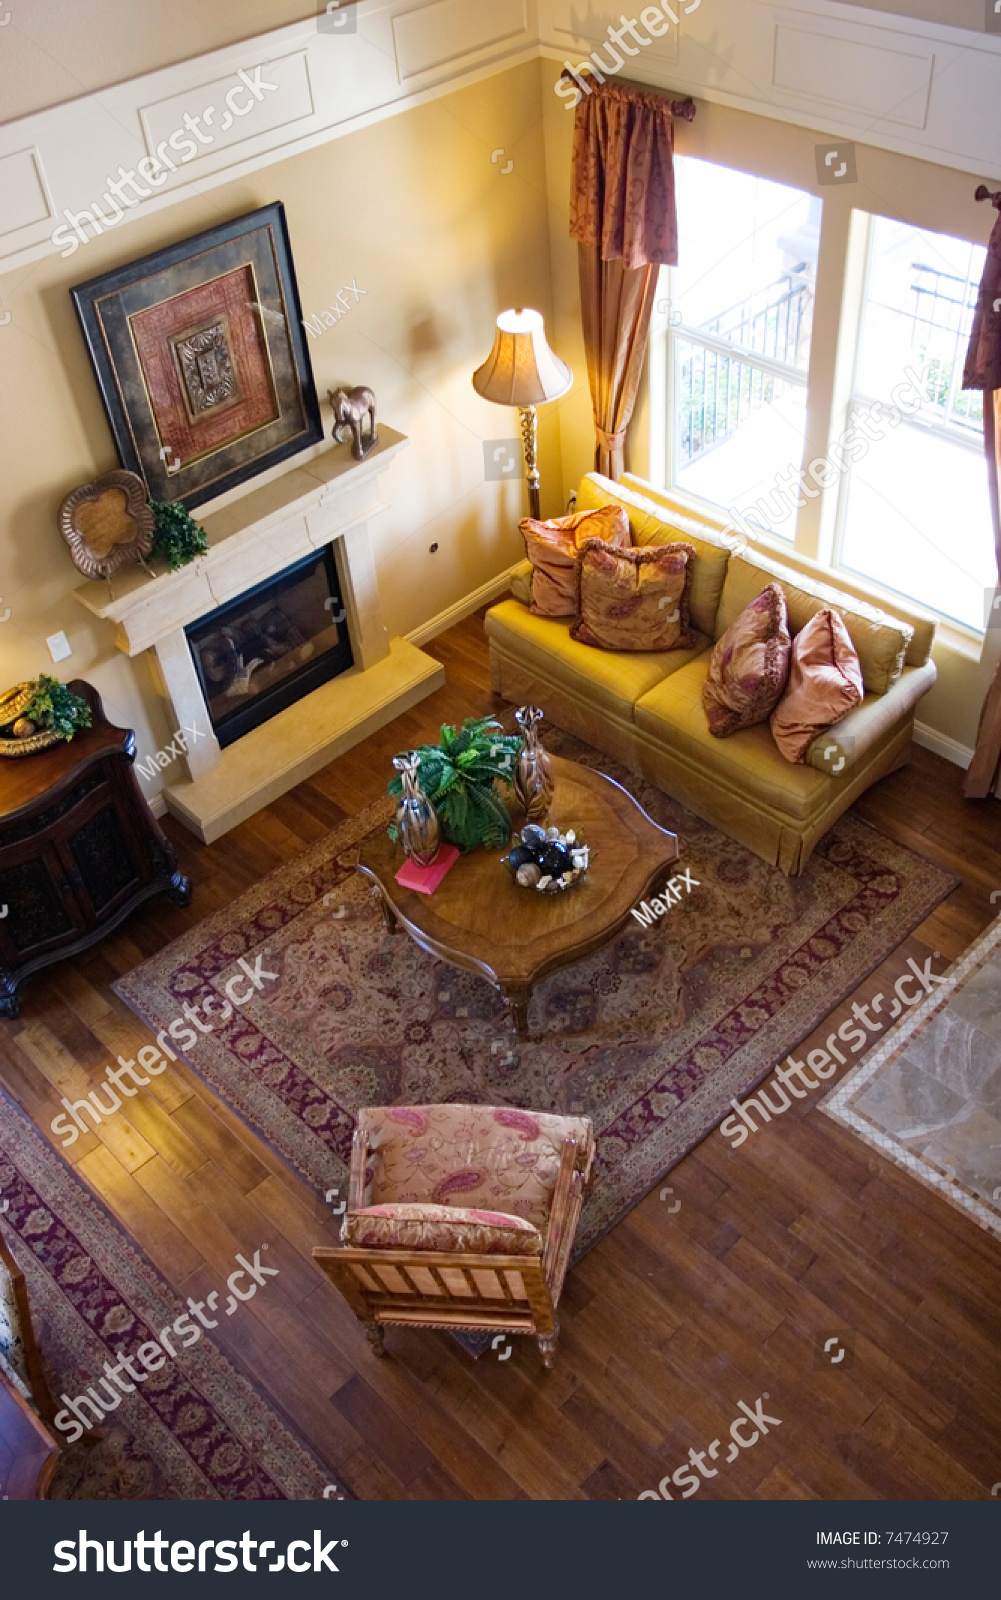 про фото уютных съемных квартир объявлений продаже аренде